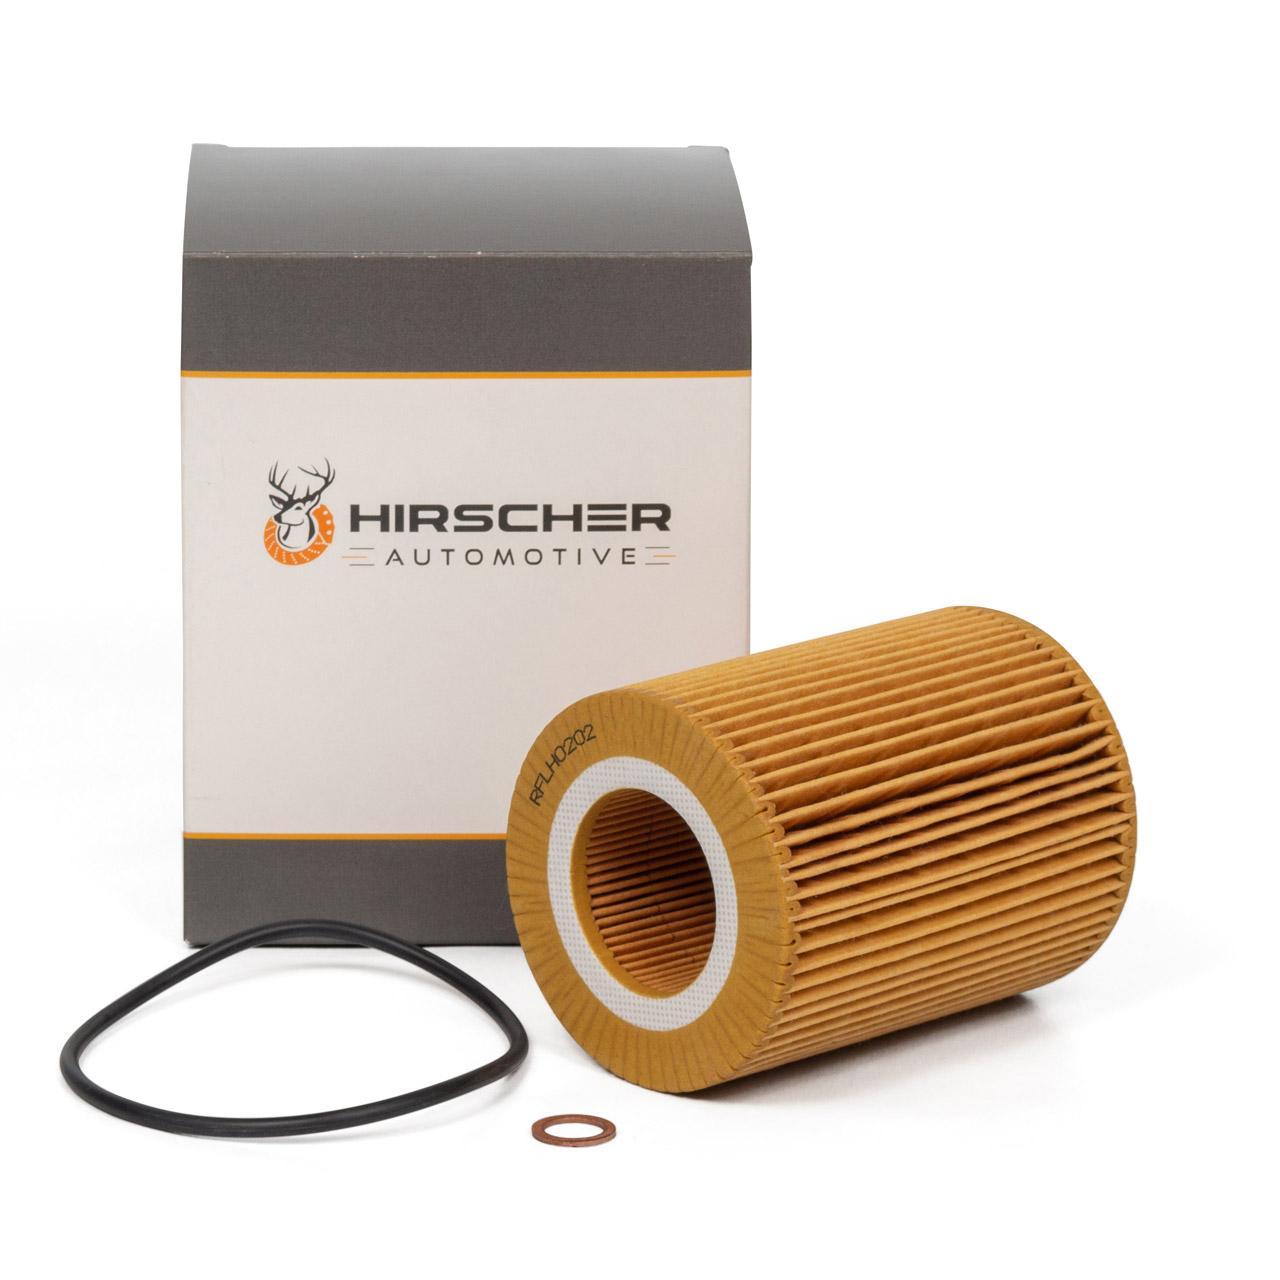 HIRSCHER Ölfilter BMW 3er E36 E46 5er E39 E60 E61 20-30i M50 M52 M54 11427512300